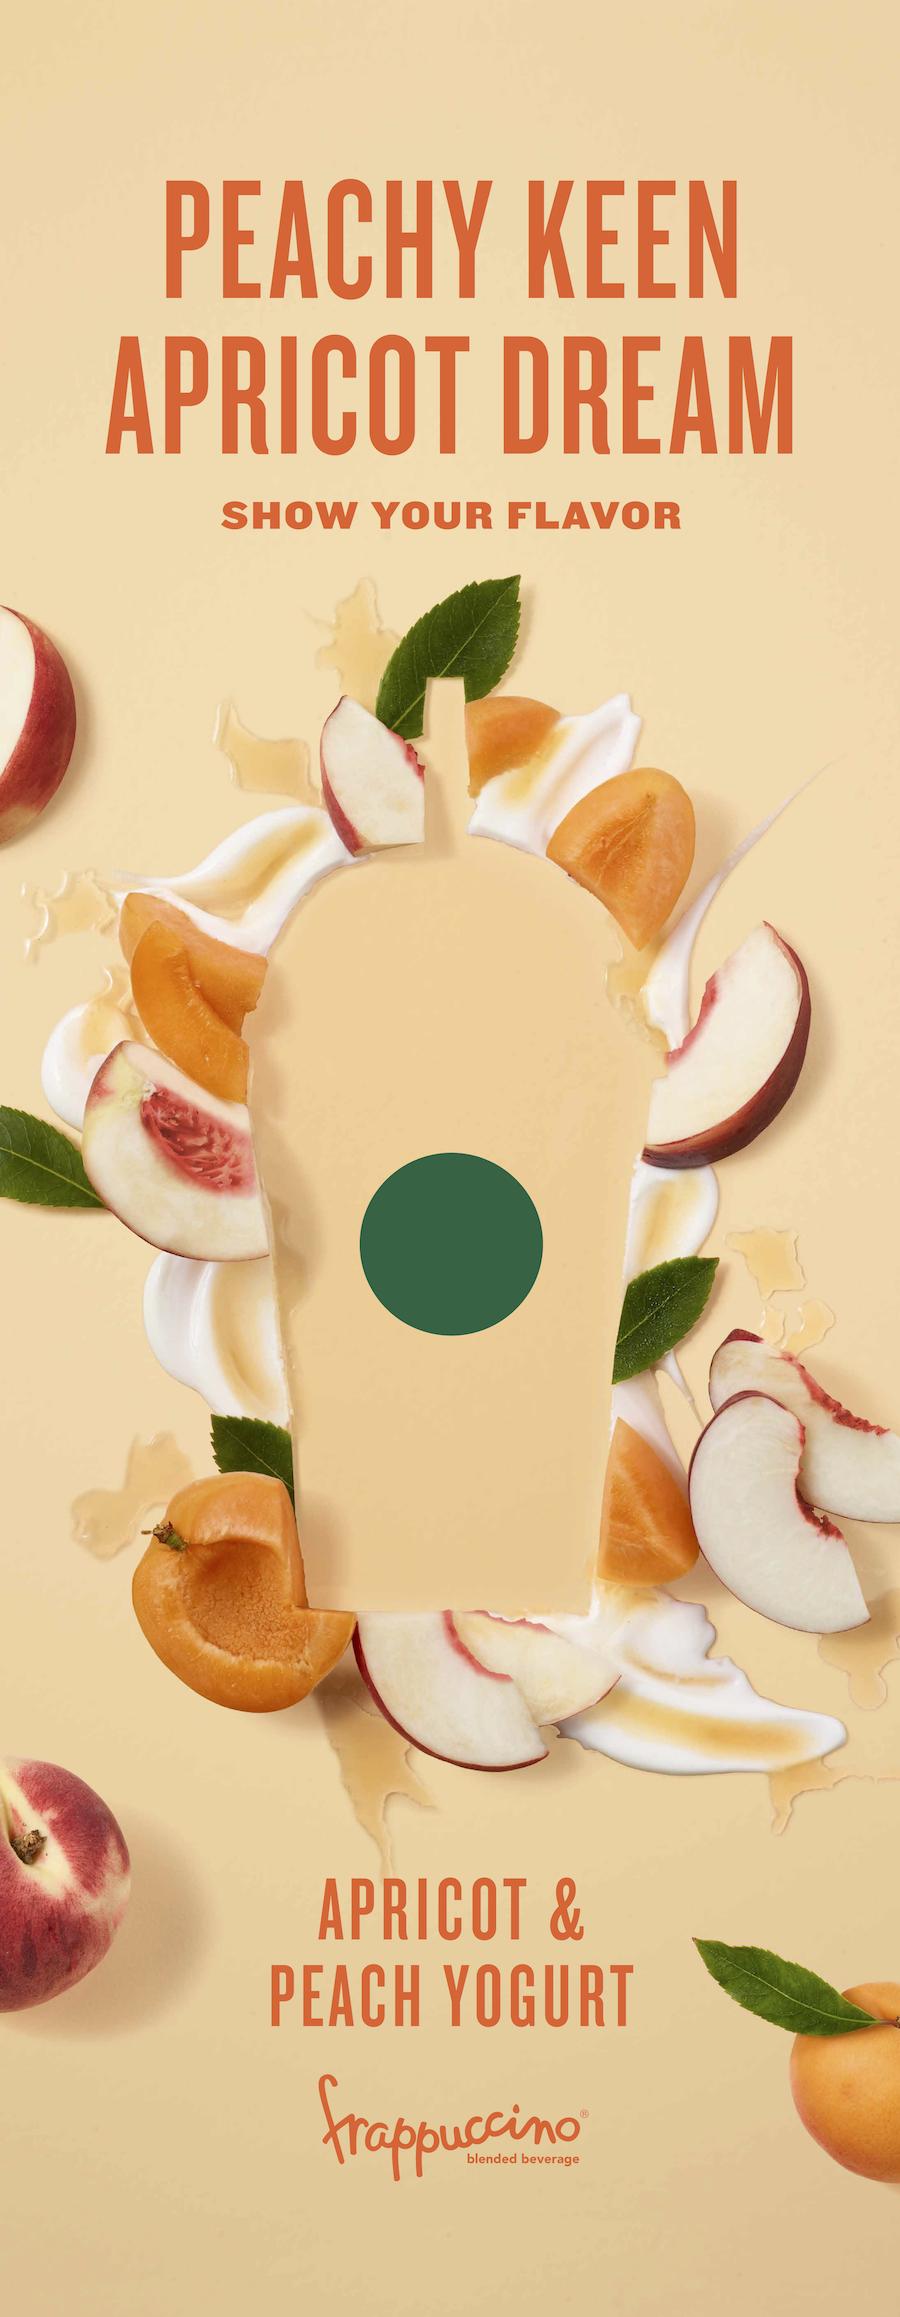 Apricot Peach Yogurt.png